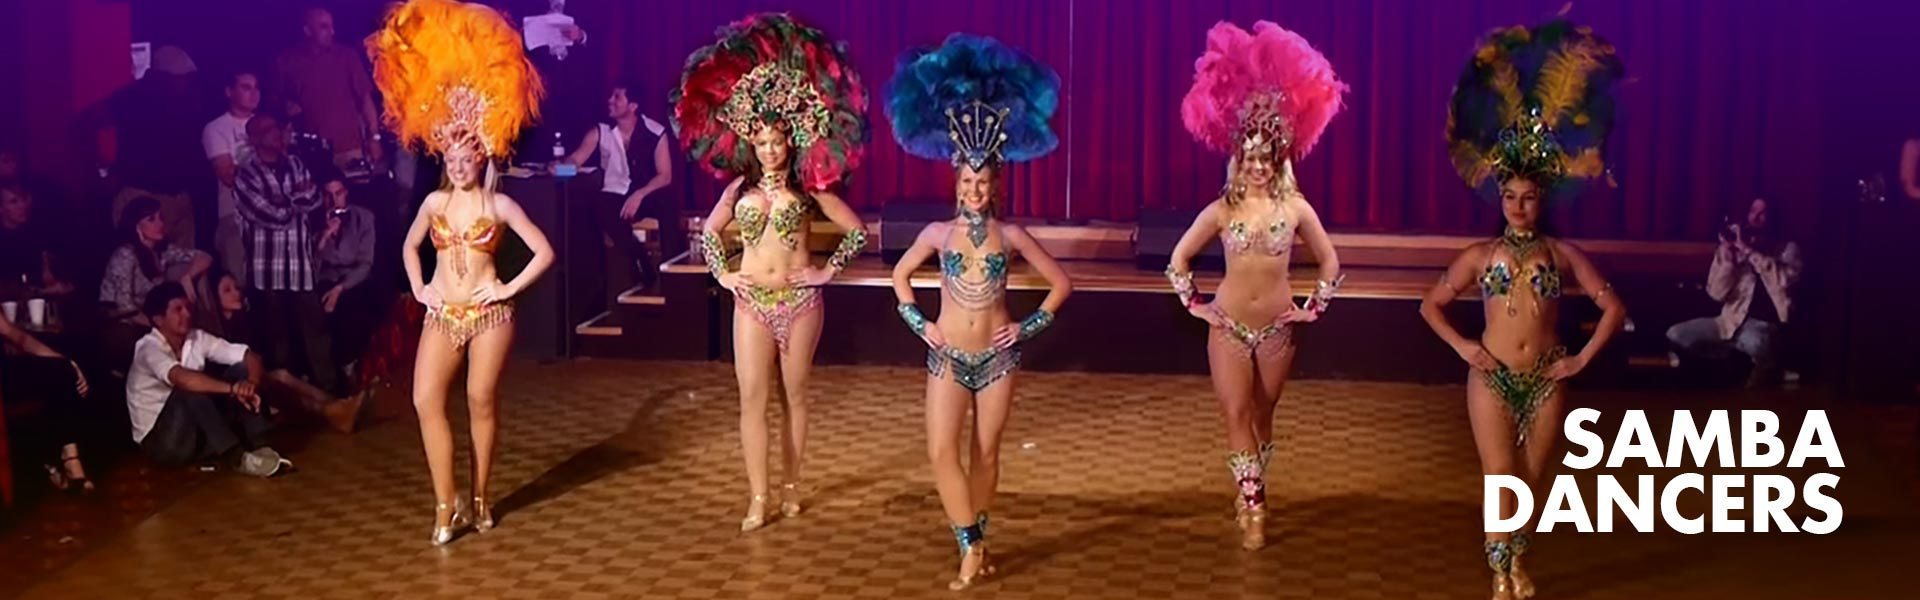 World Beat presents The Best Samba Dancers in Sydney